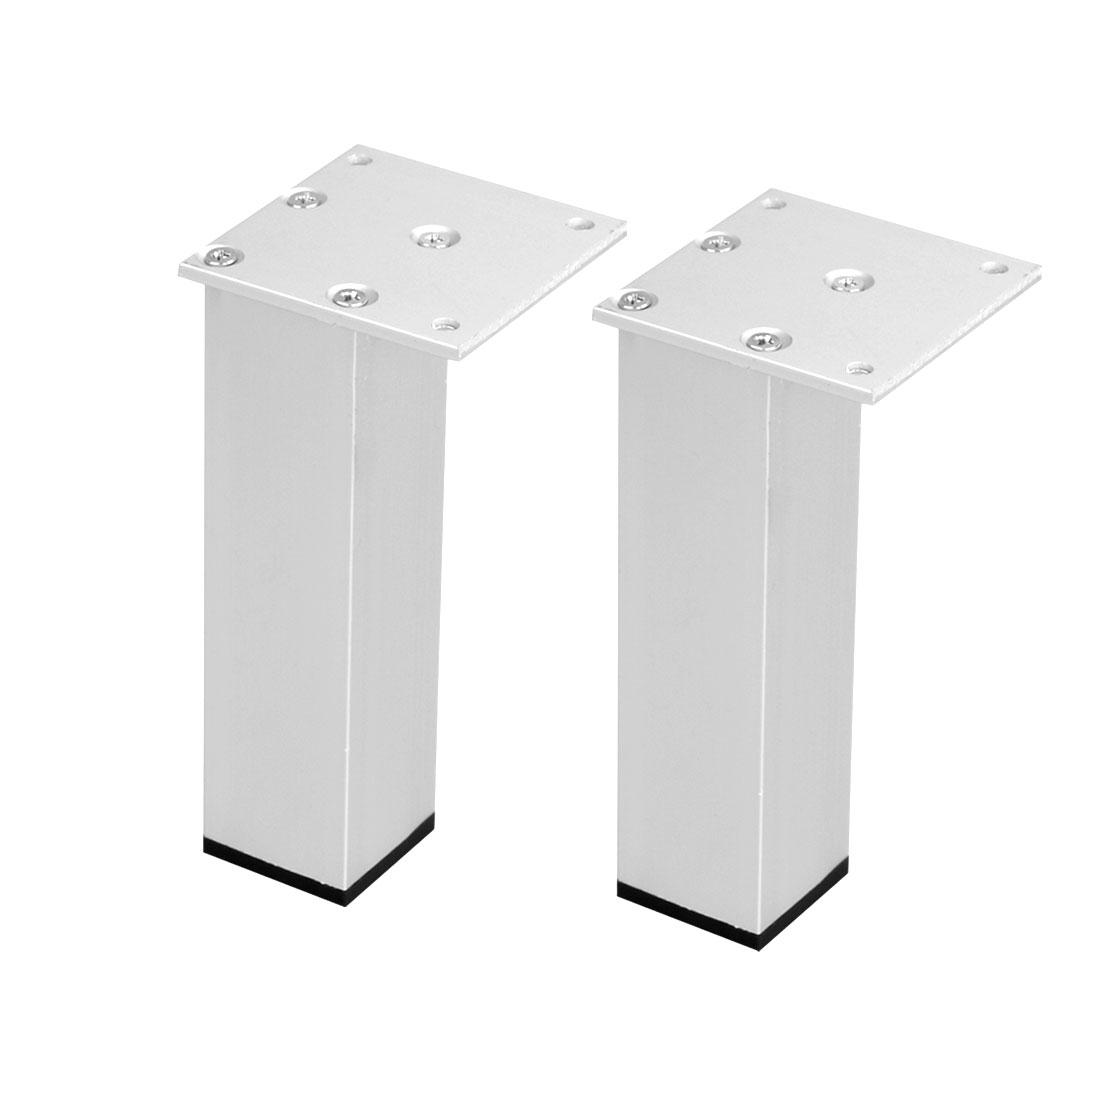 "6"" Furniture Legs Aluminium Alloy Table Feet Replacement Height Adjuster 2pcs"